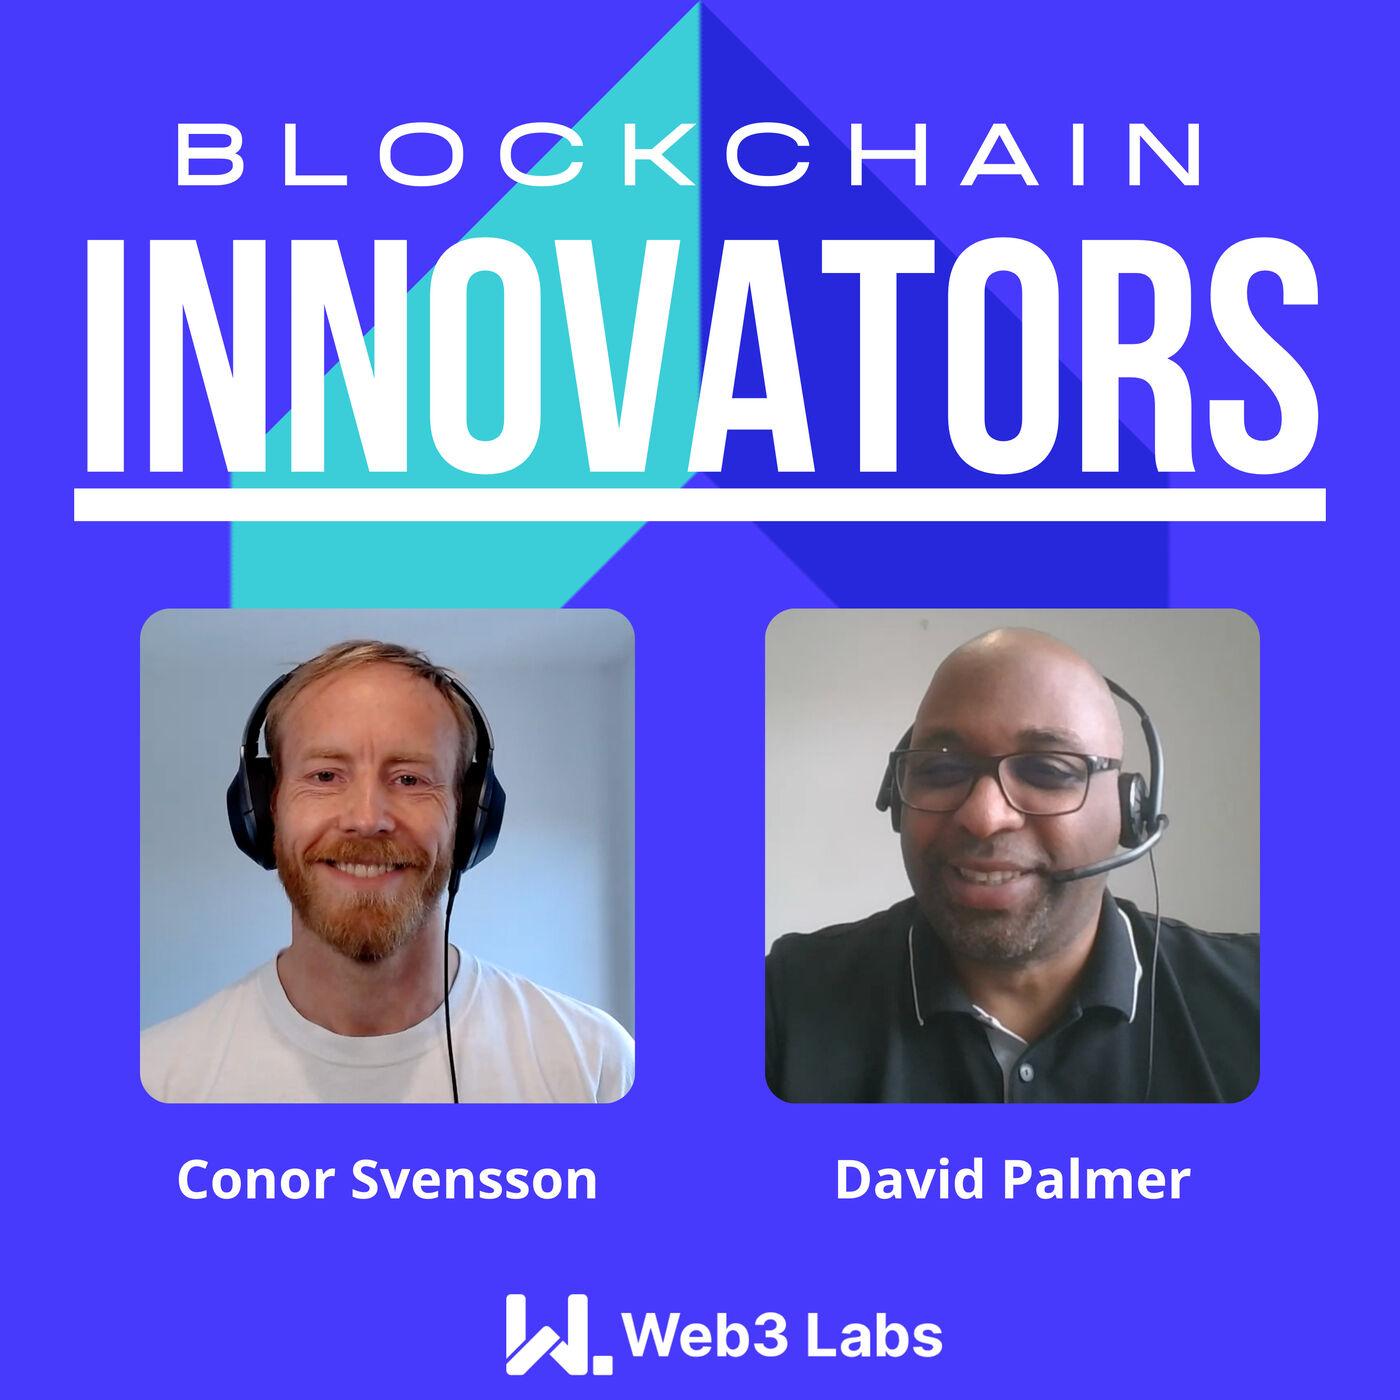 Blockchain Innovators with Conor Svensson and David Palmer